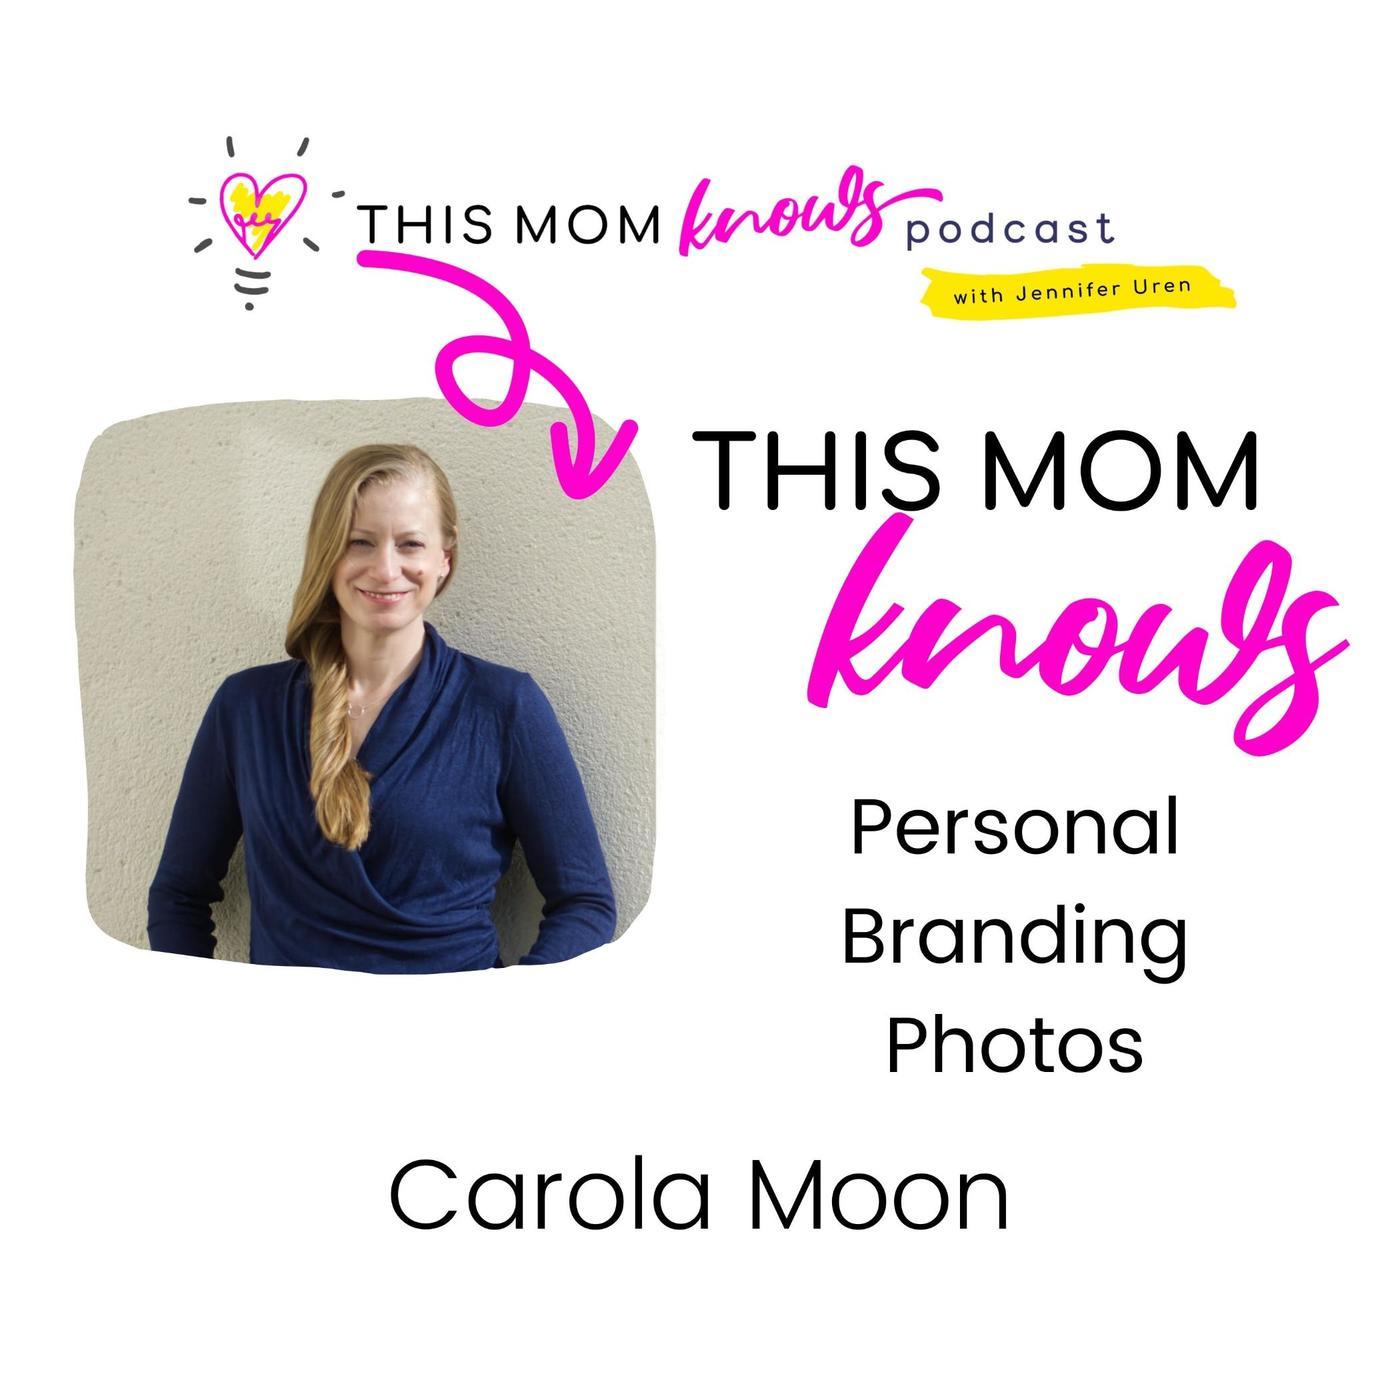 Carola Moon on Personal Branding Photos